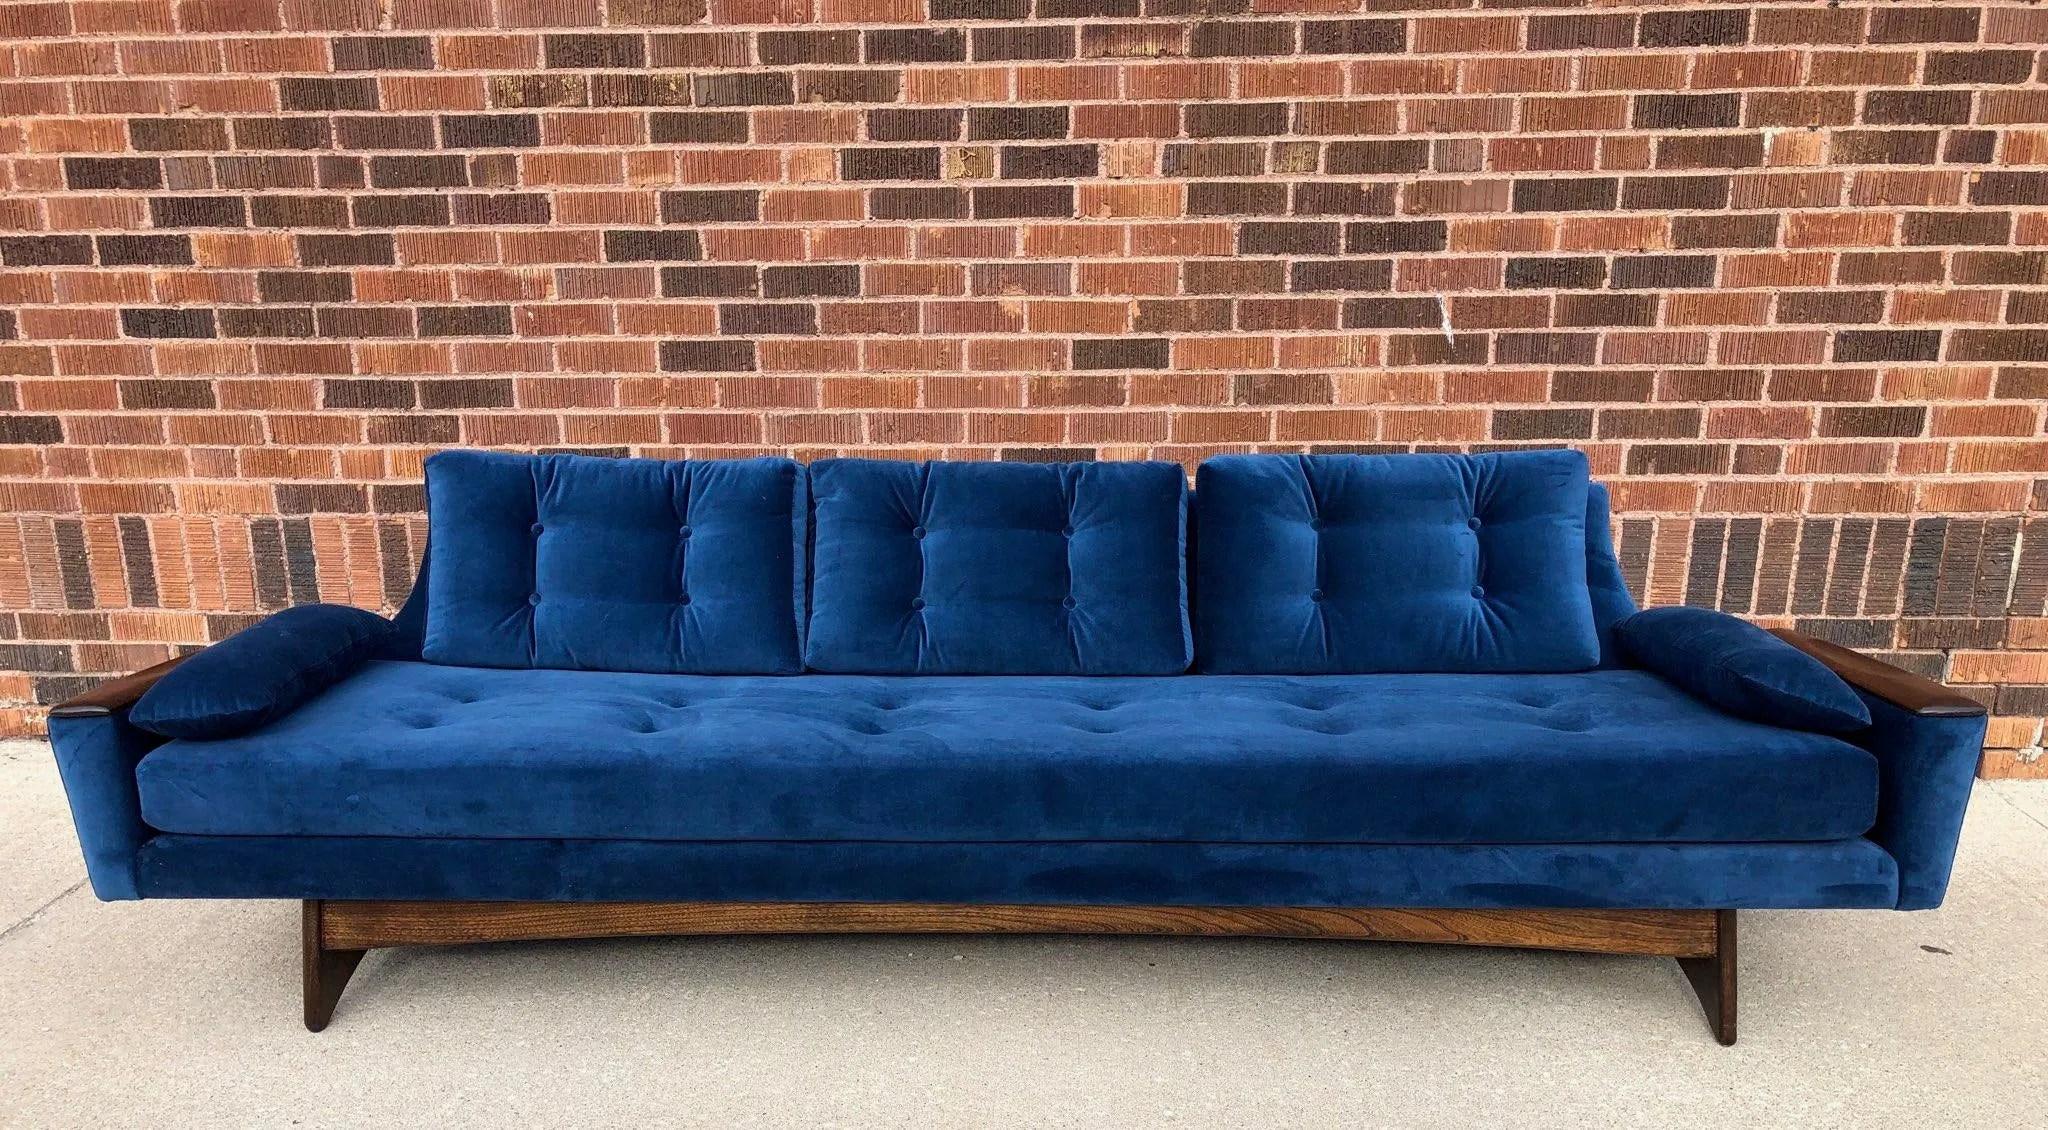 buy used and vintage furniture online